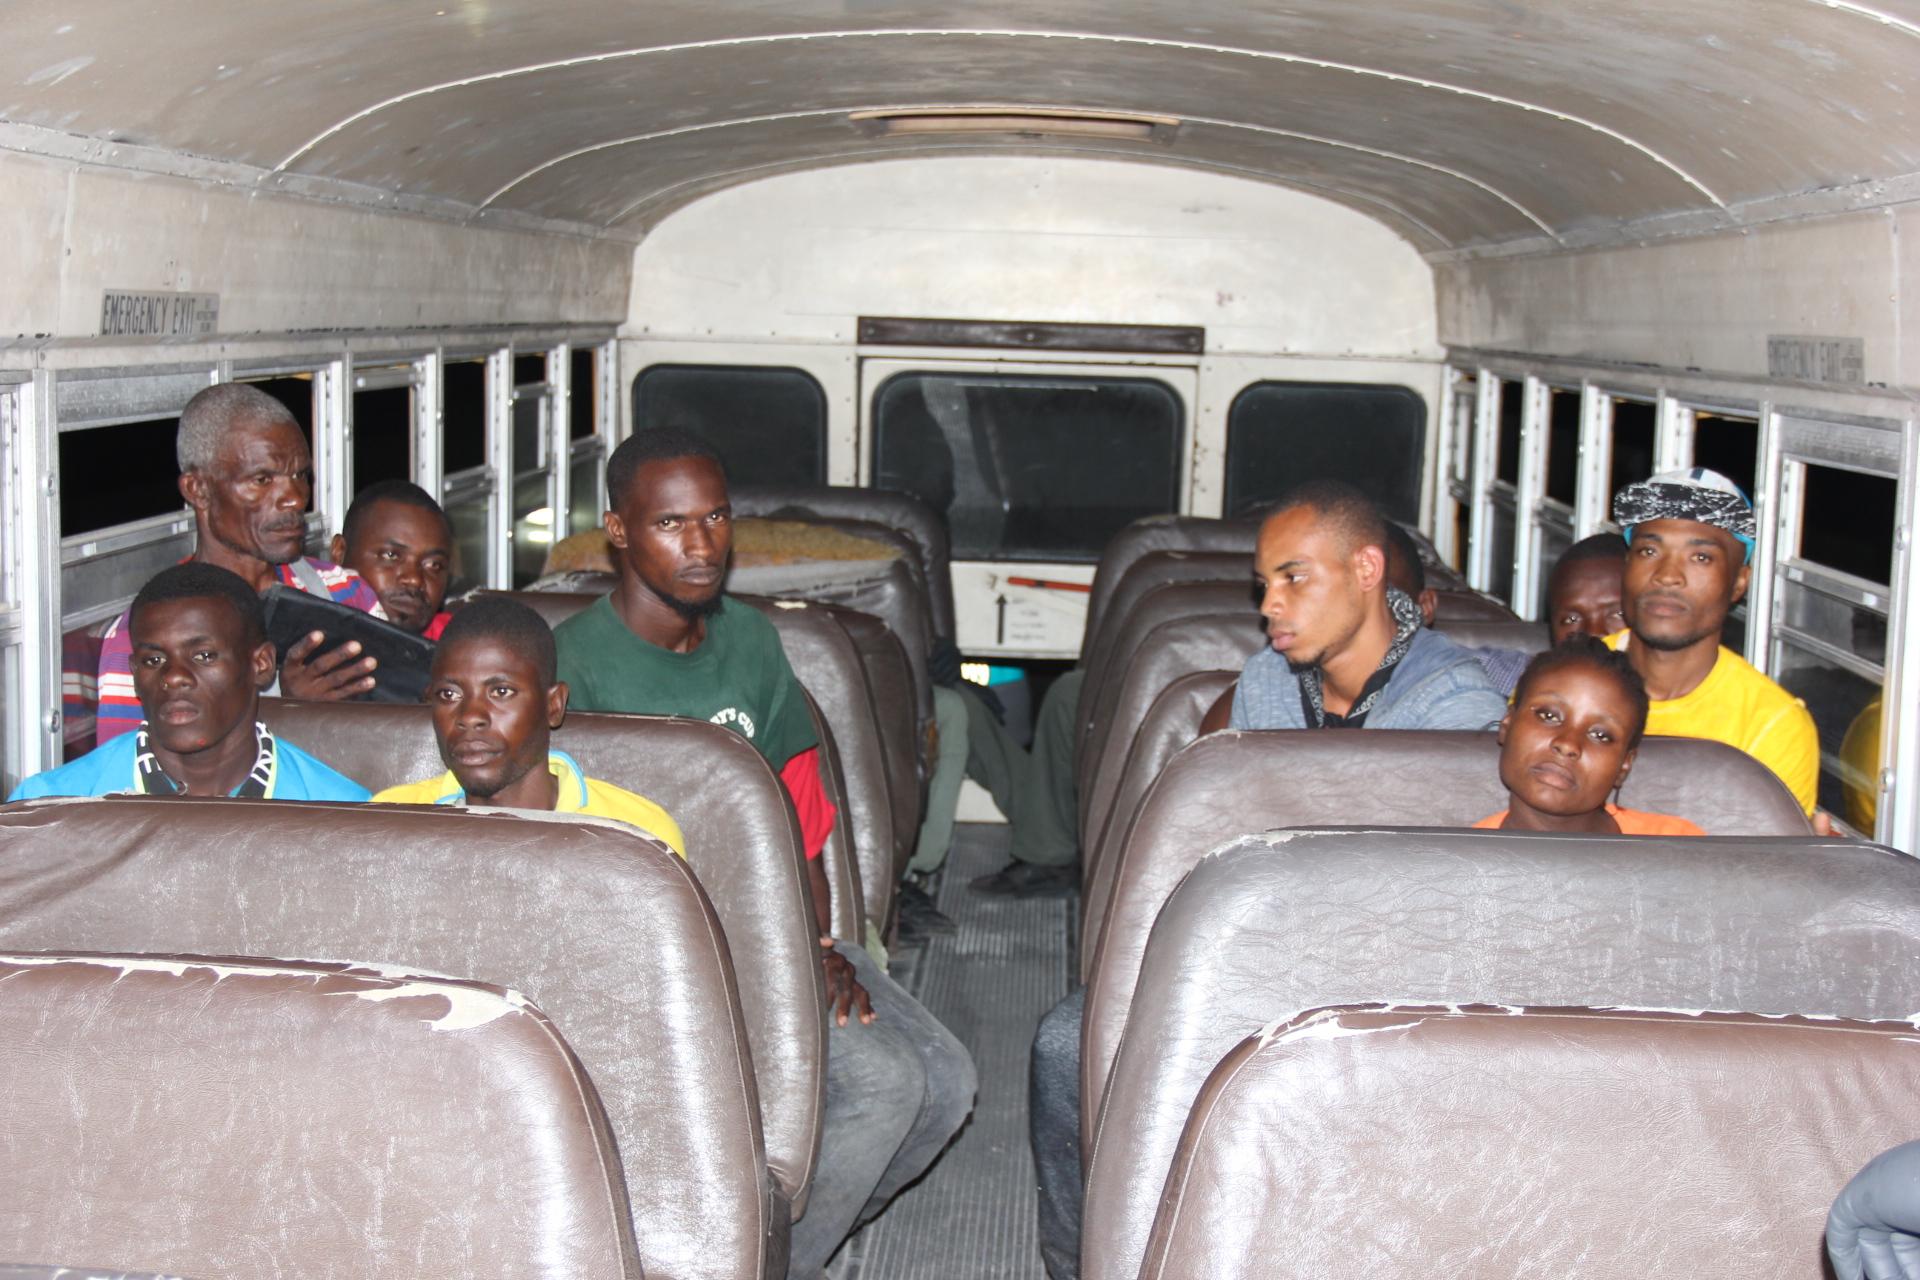 Bah haitians Feb 9